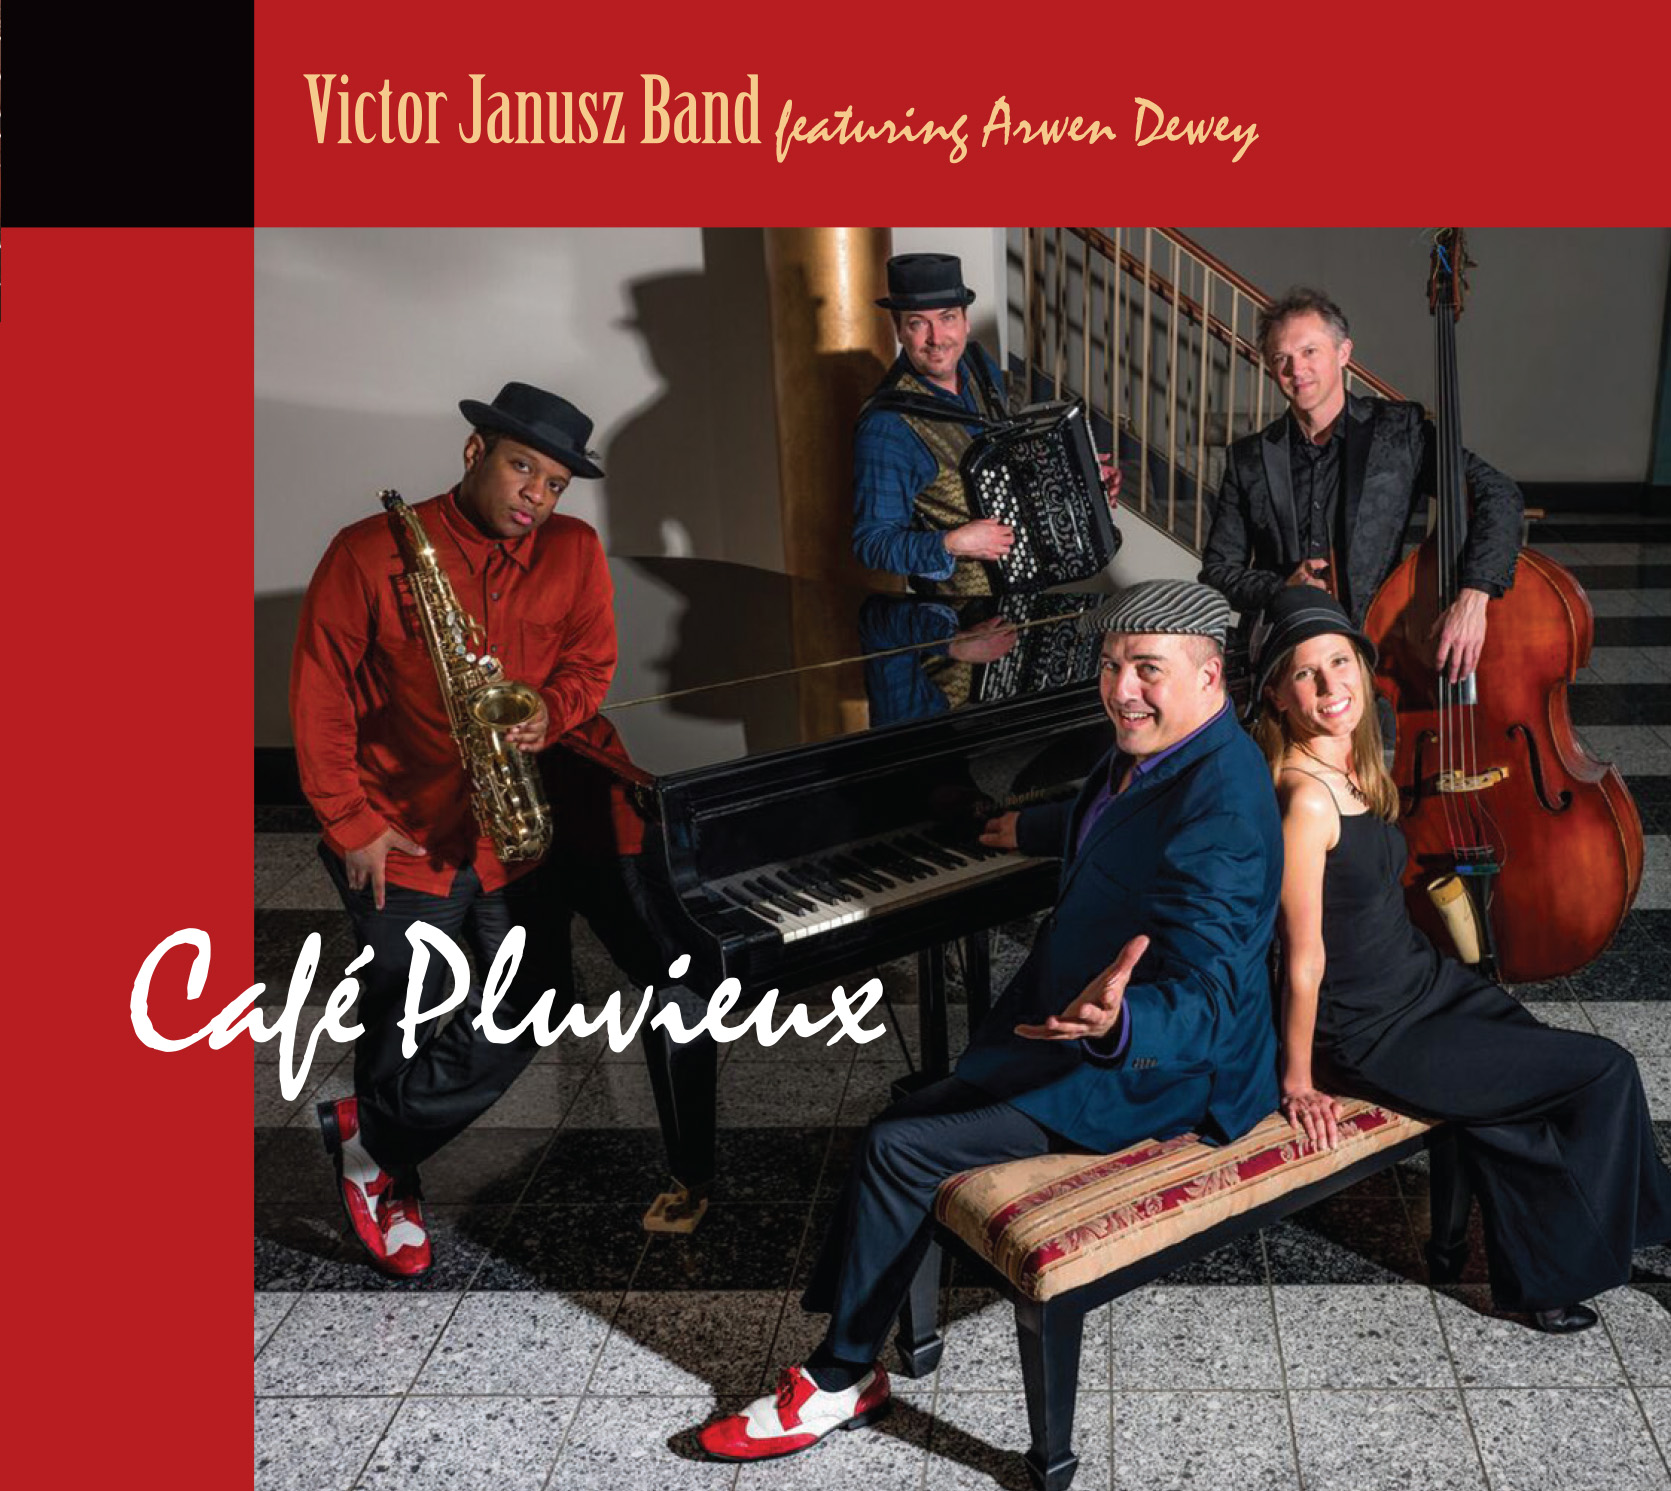 Jazz Pianist/Singer-Songwriter